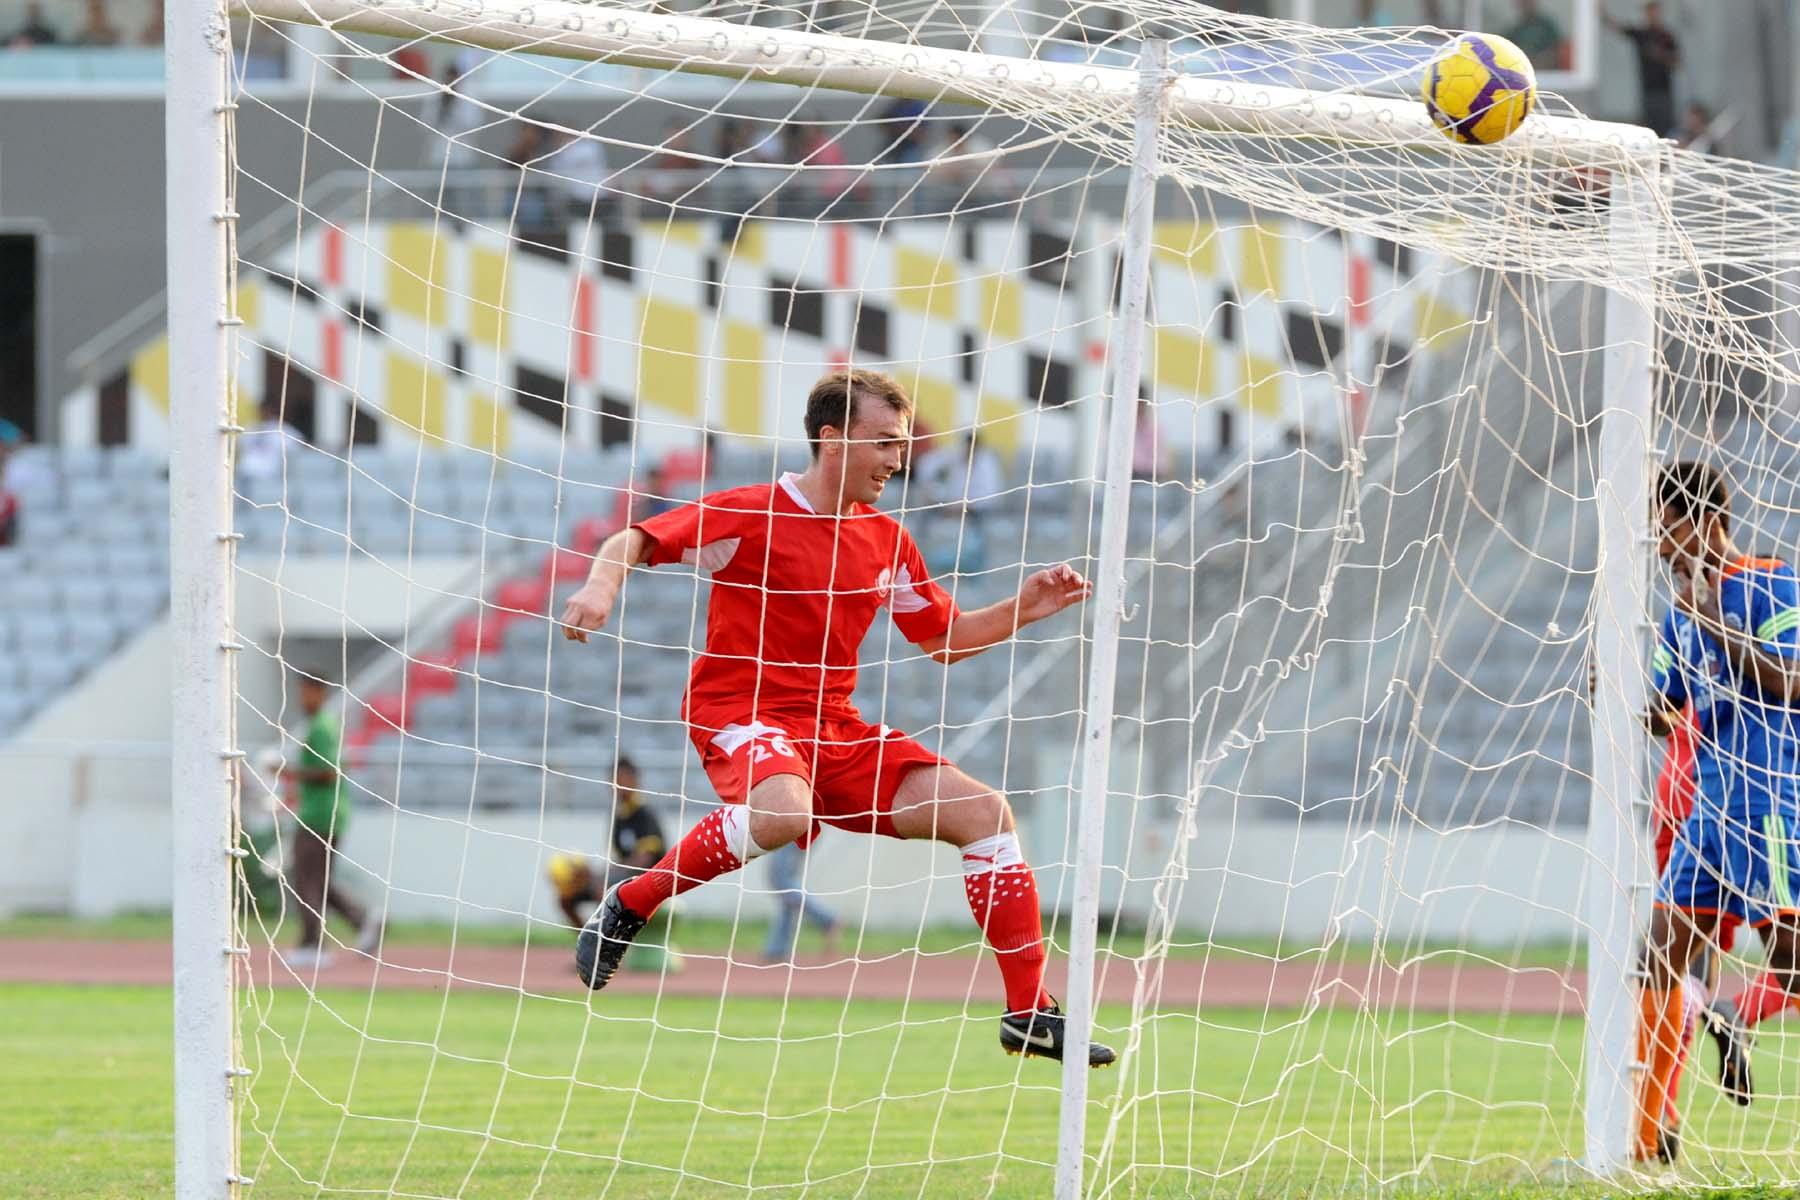 Борис Кочкин: Уровень 3-го дивизиона еще далек от Чемпионата Бангладеша